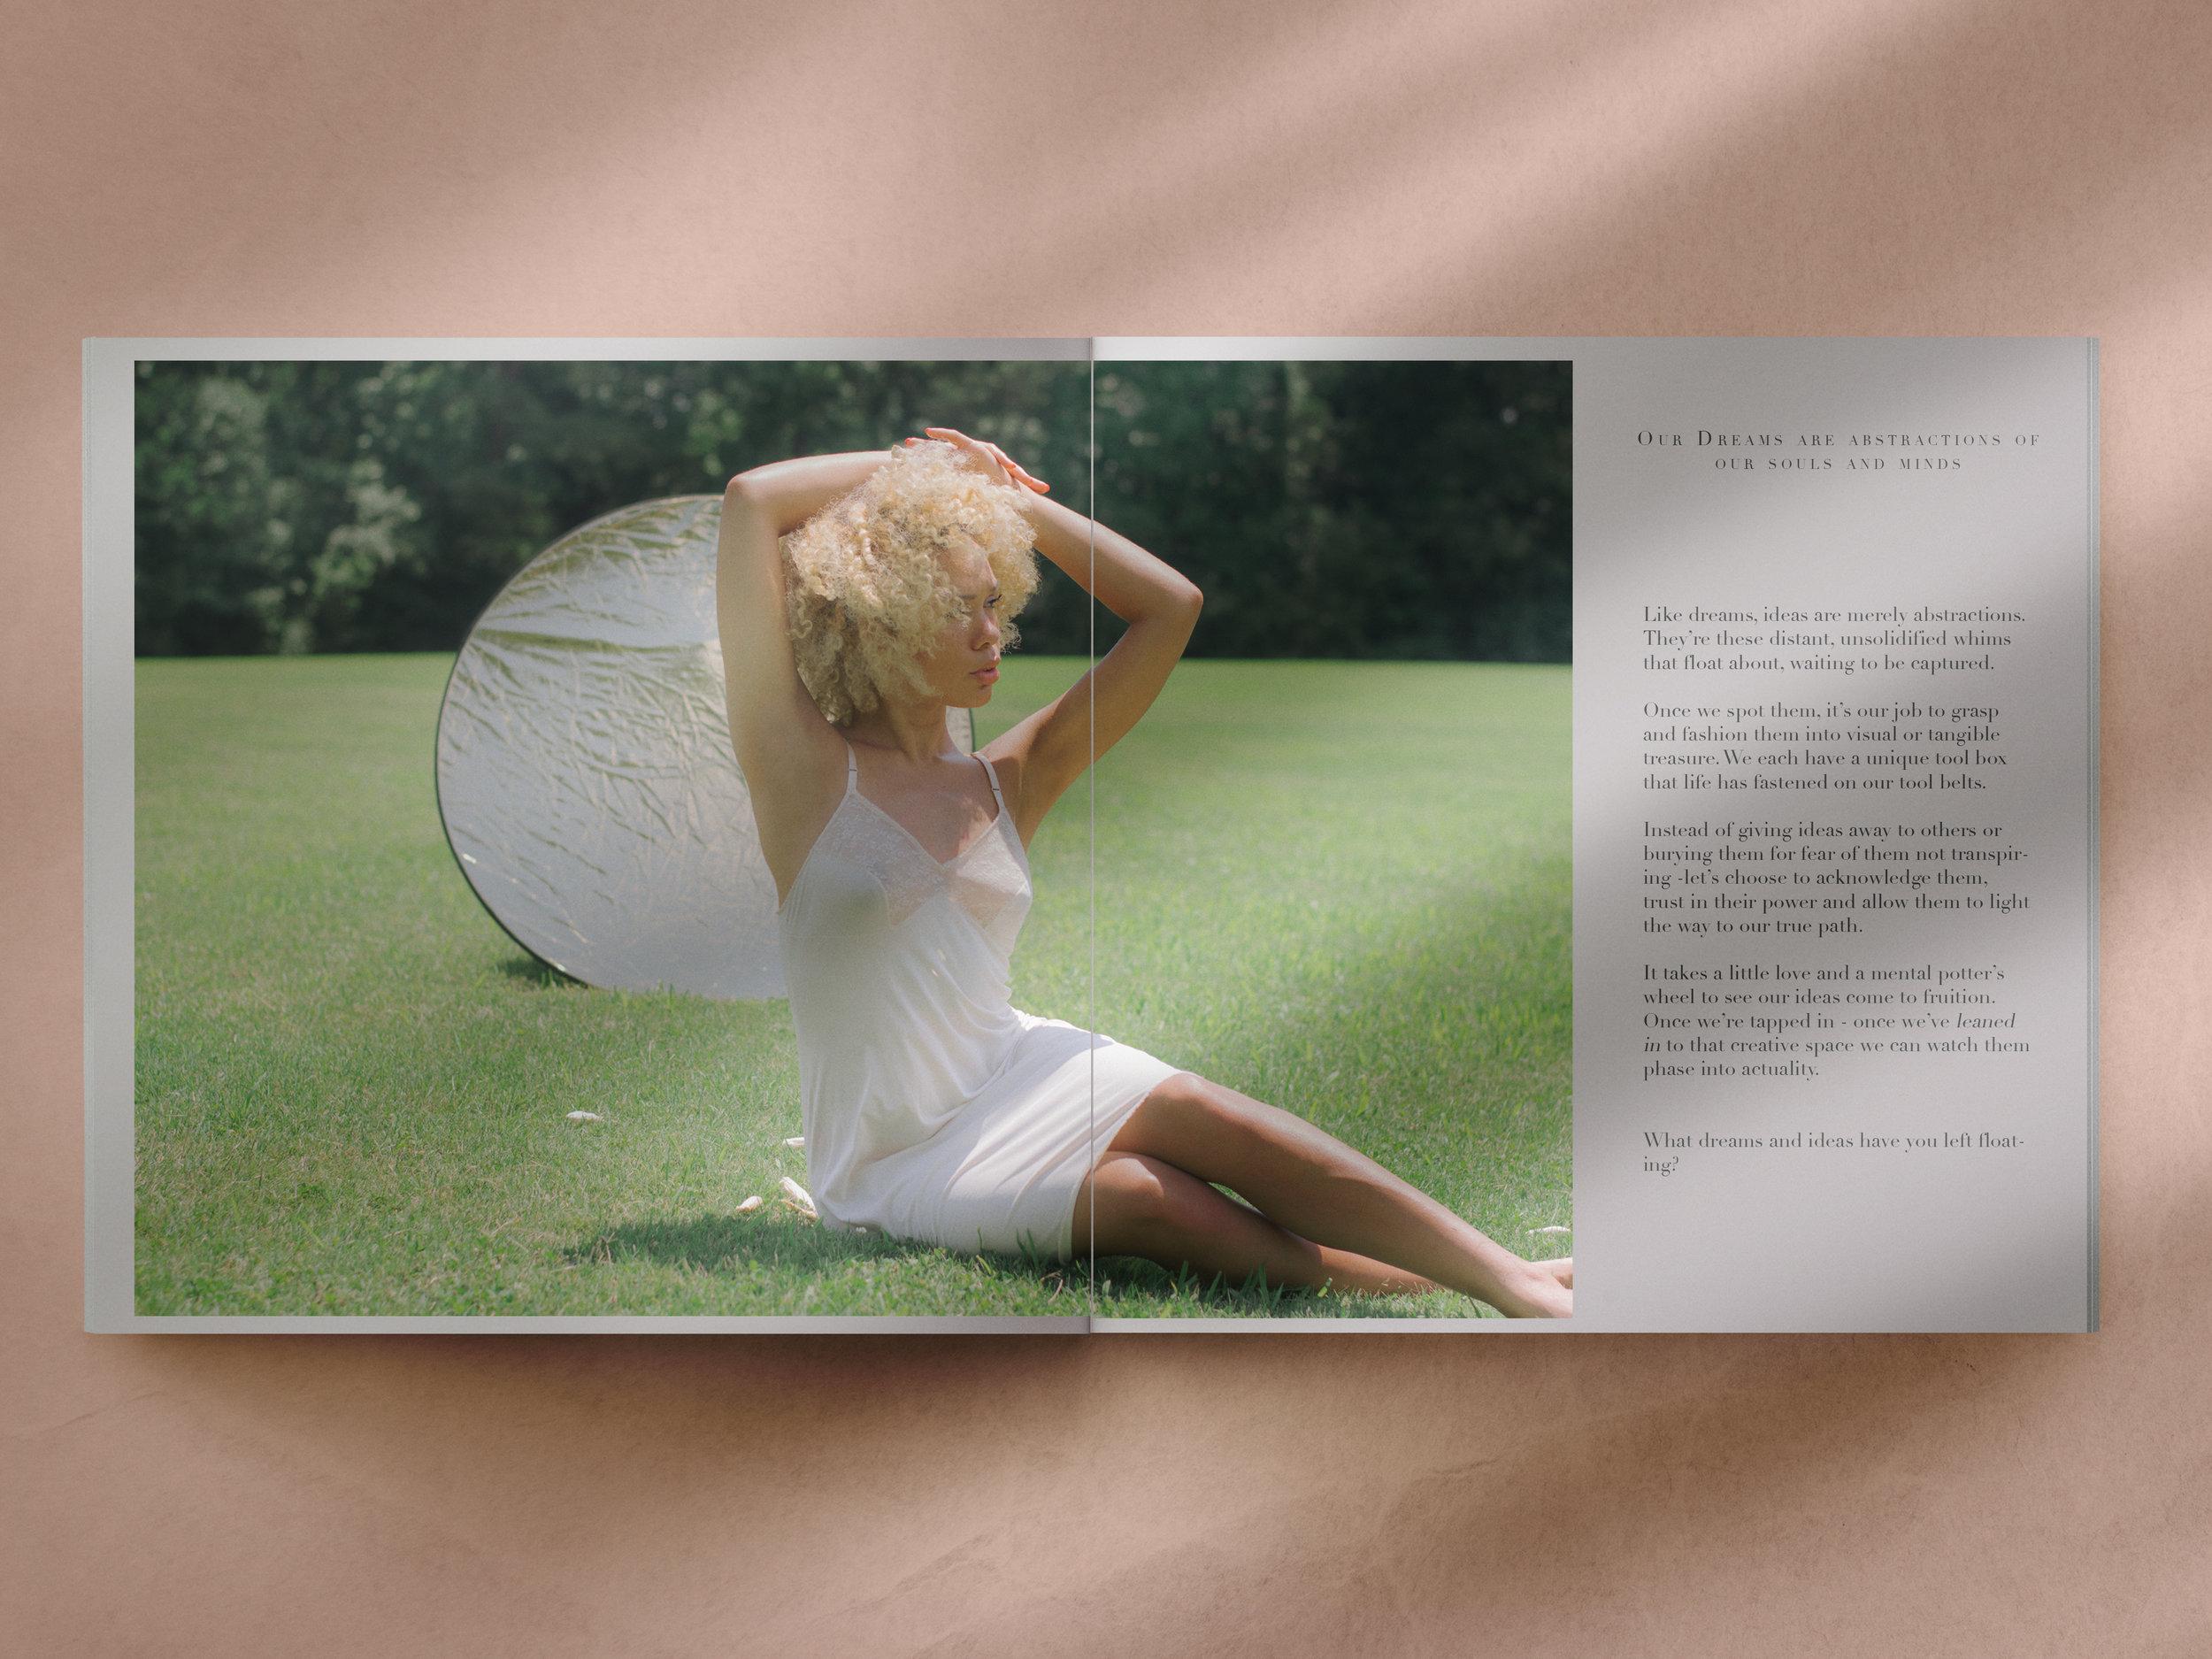 A Retro Summer Dream Page 4-5 Issue 2.jpg